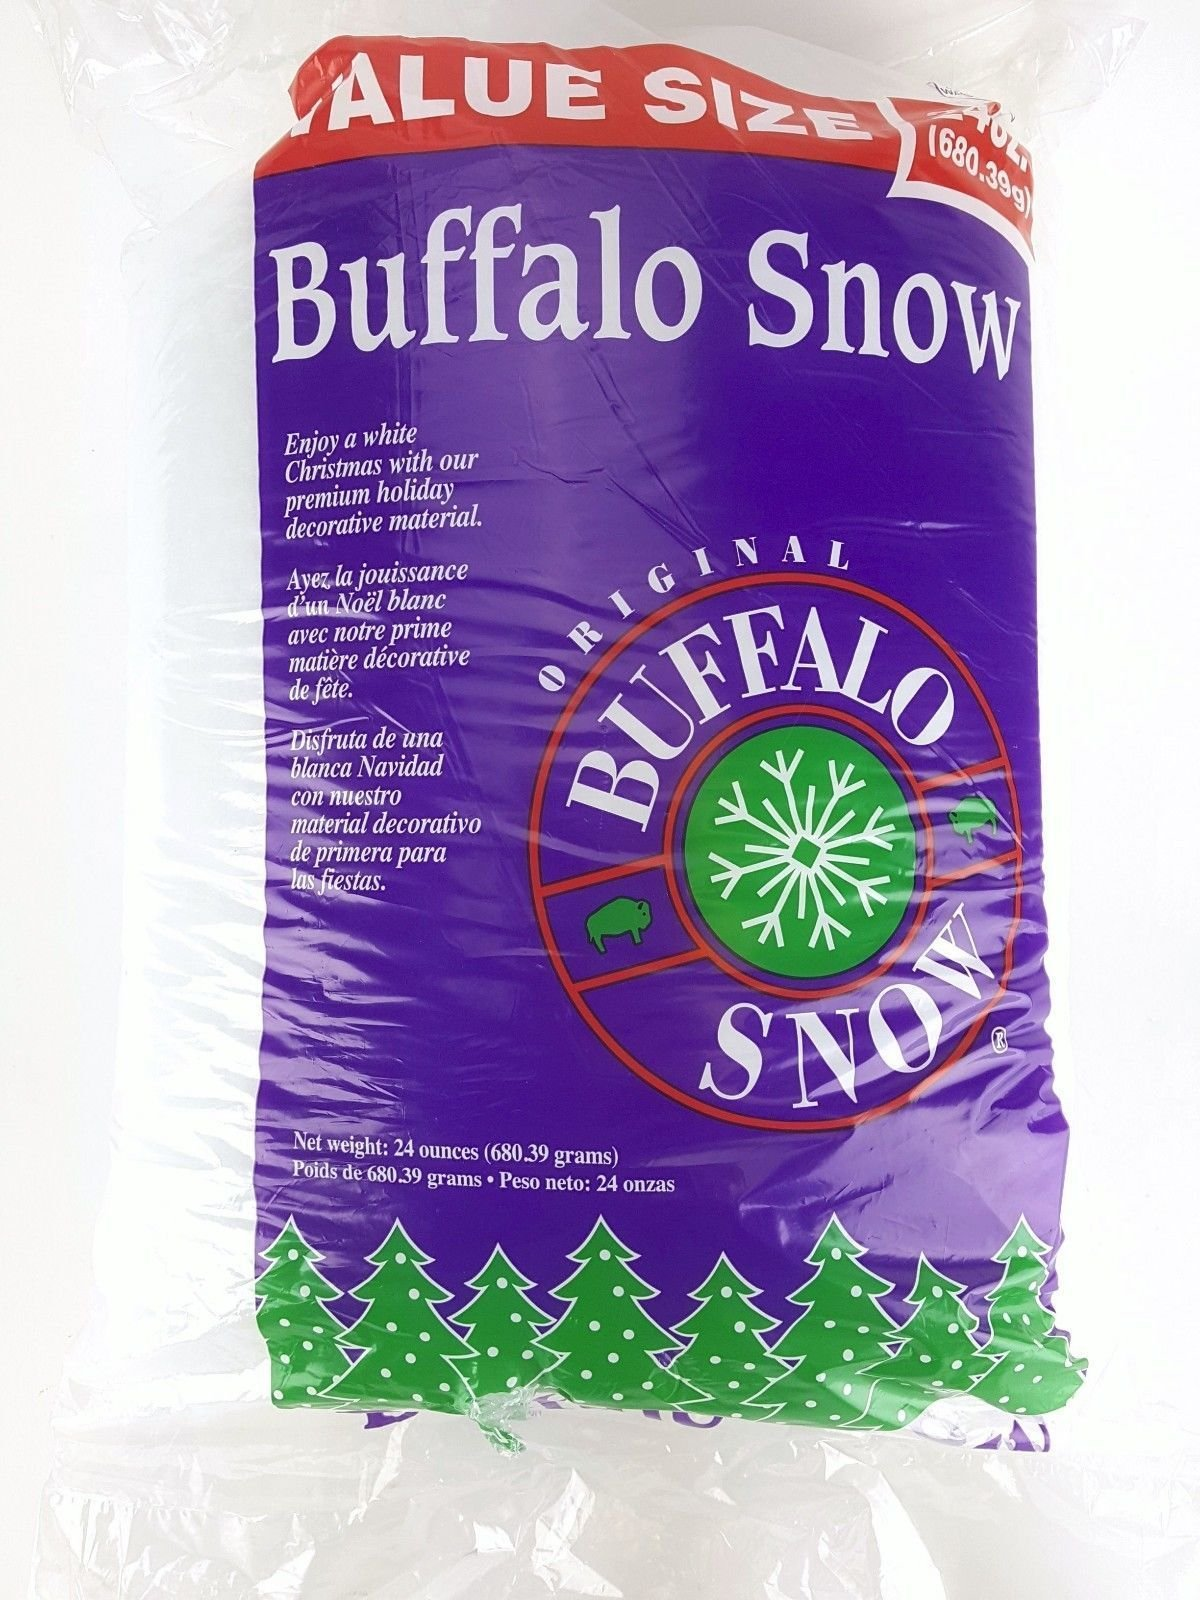 Original Buffalo Snow Crafts Pillow Blanket Village Snow Christmas Decoration Jumbo 24 oz Value Bag